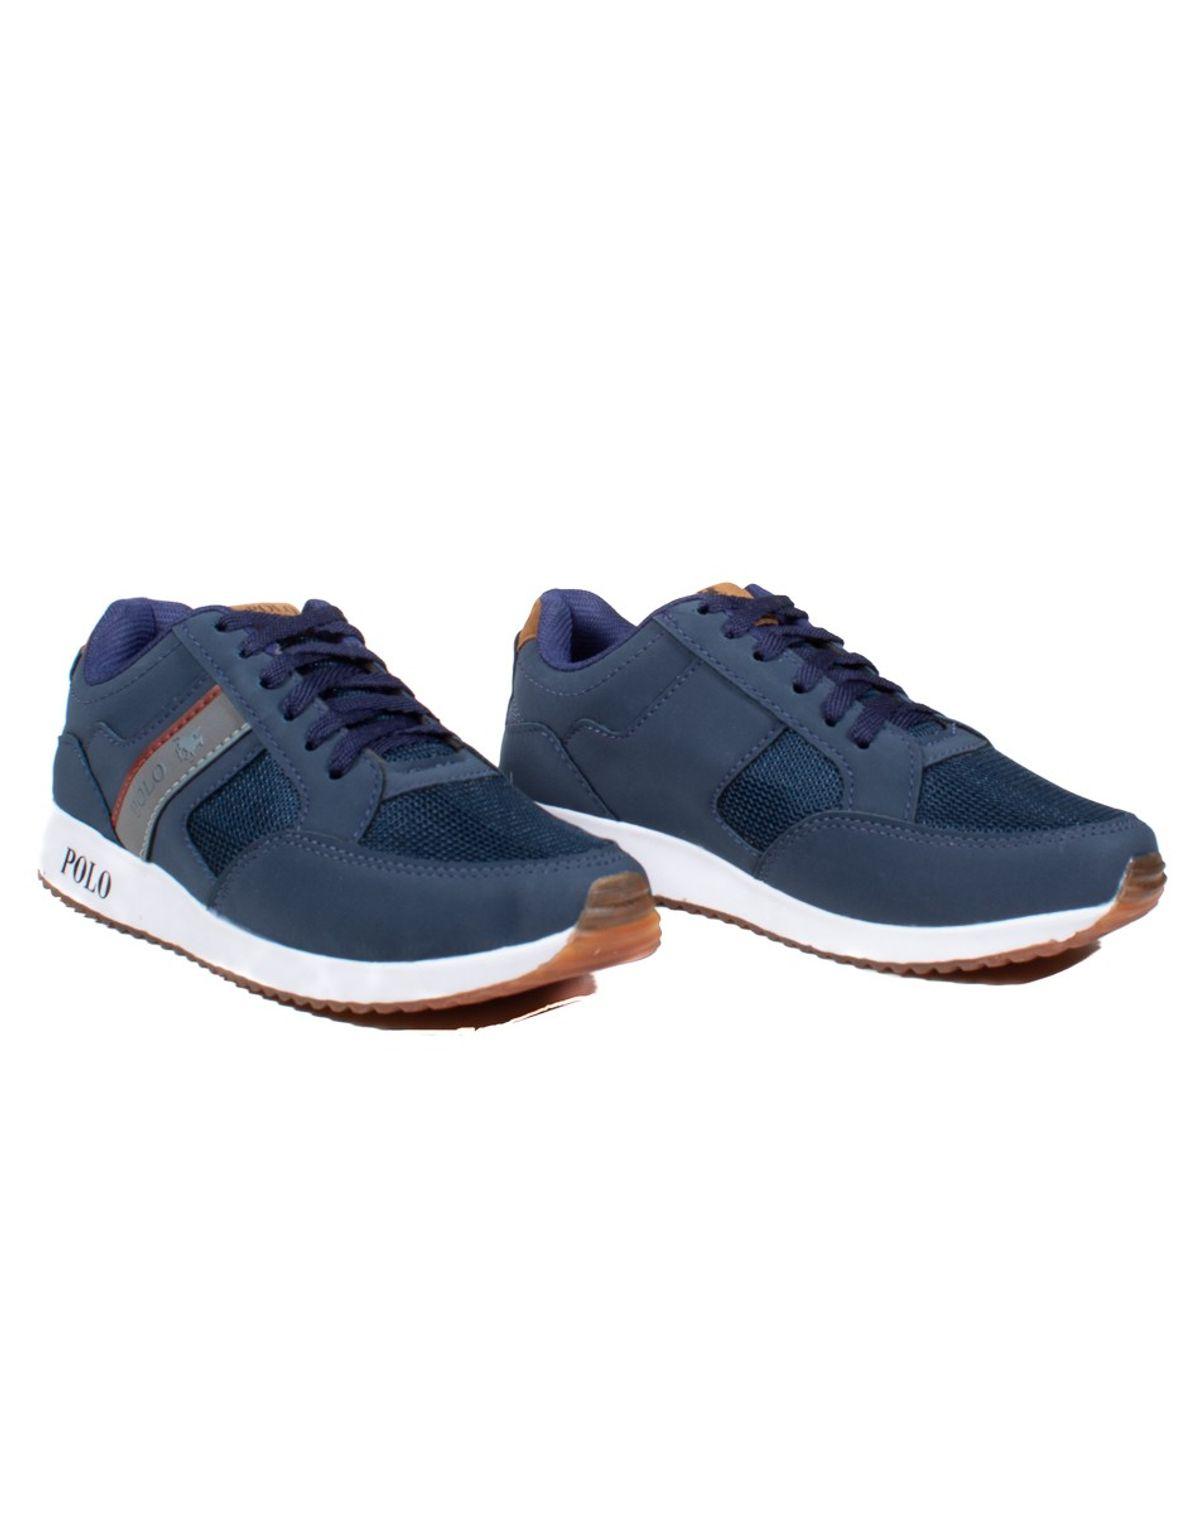 2050001847805-Tenis-Masculino-Jogging-Polo-Happy-MARINHO-37-1